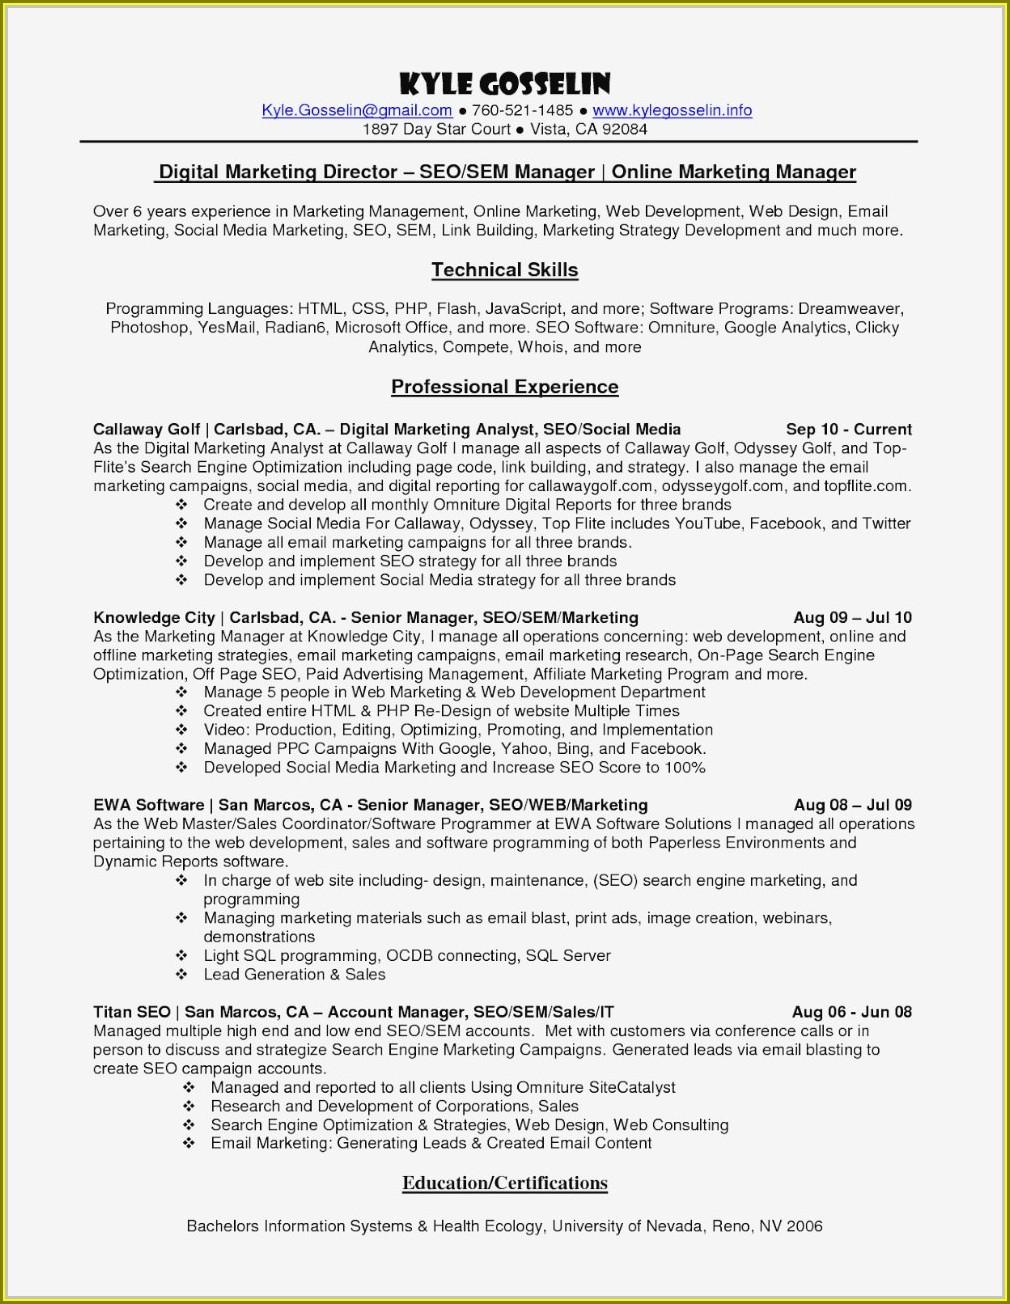 Digital Marketing Resume Sample Free Download